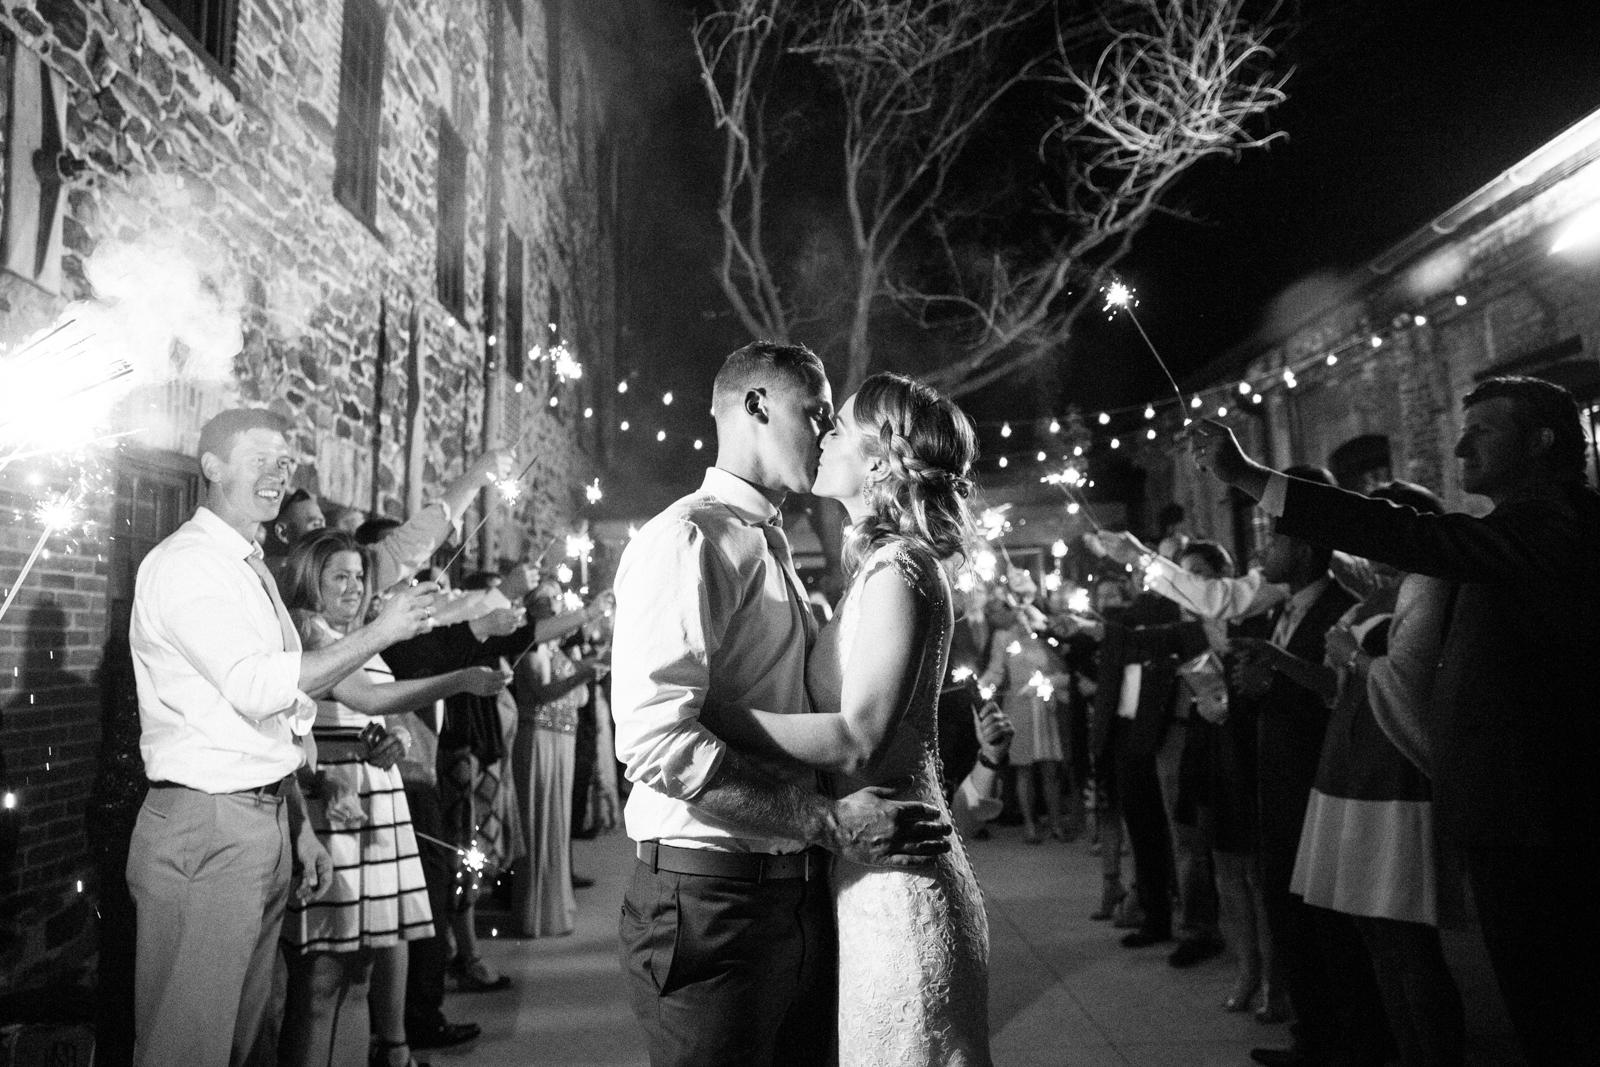 mt-washington-mill-dye-house-wedding-photography-baltimore-maryland.jpg